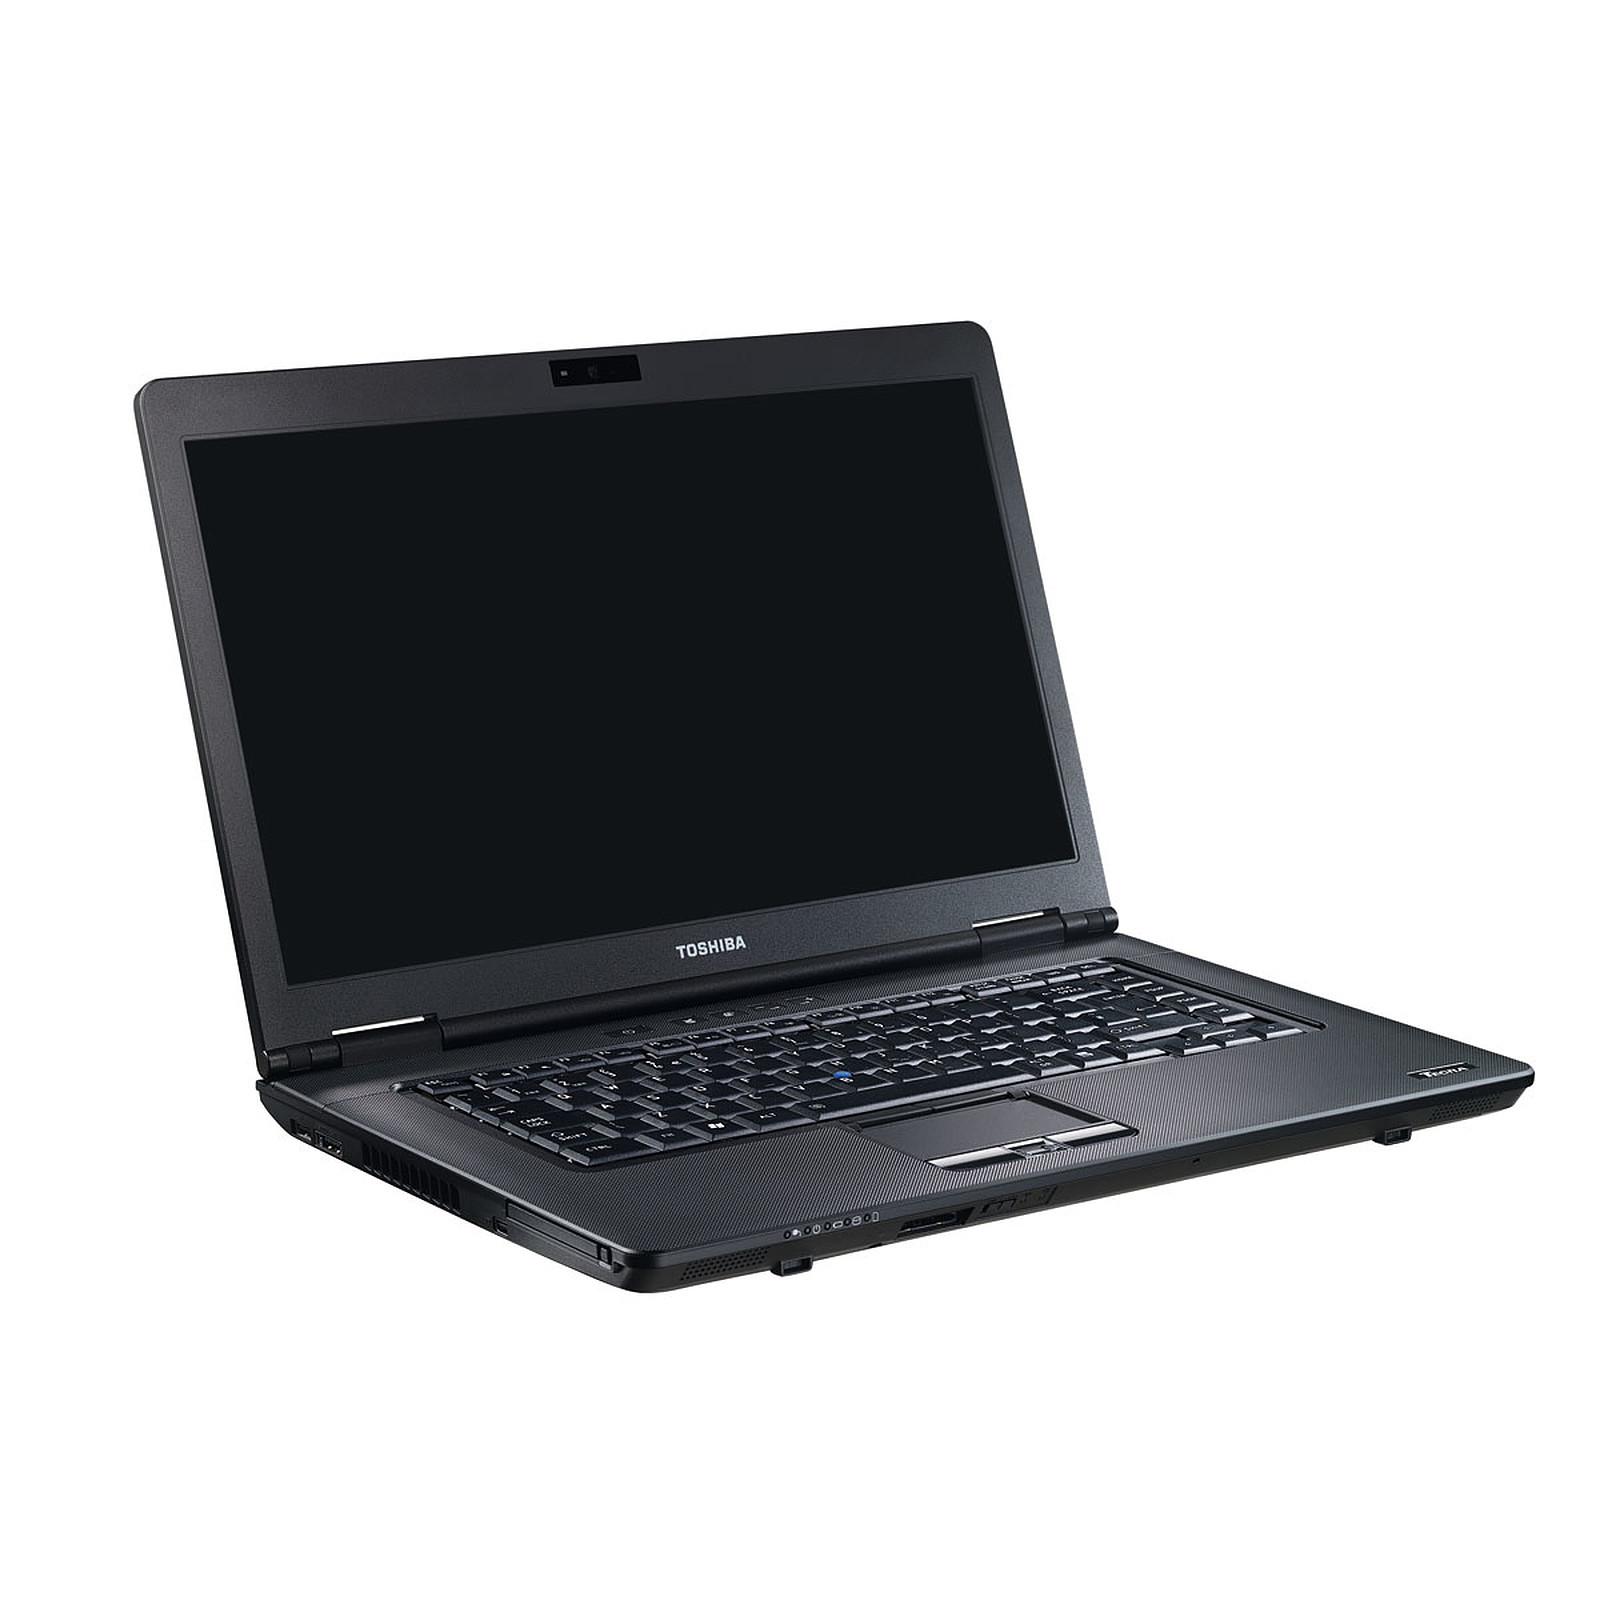 Toshiba Tecra S11-15H